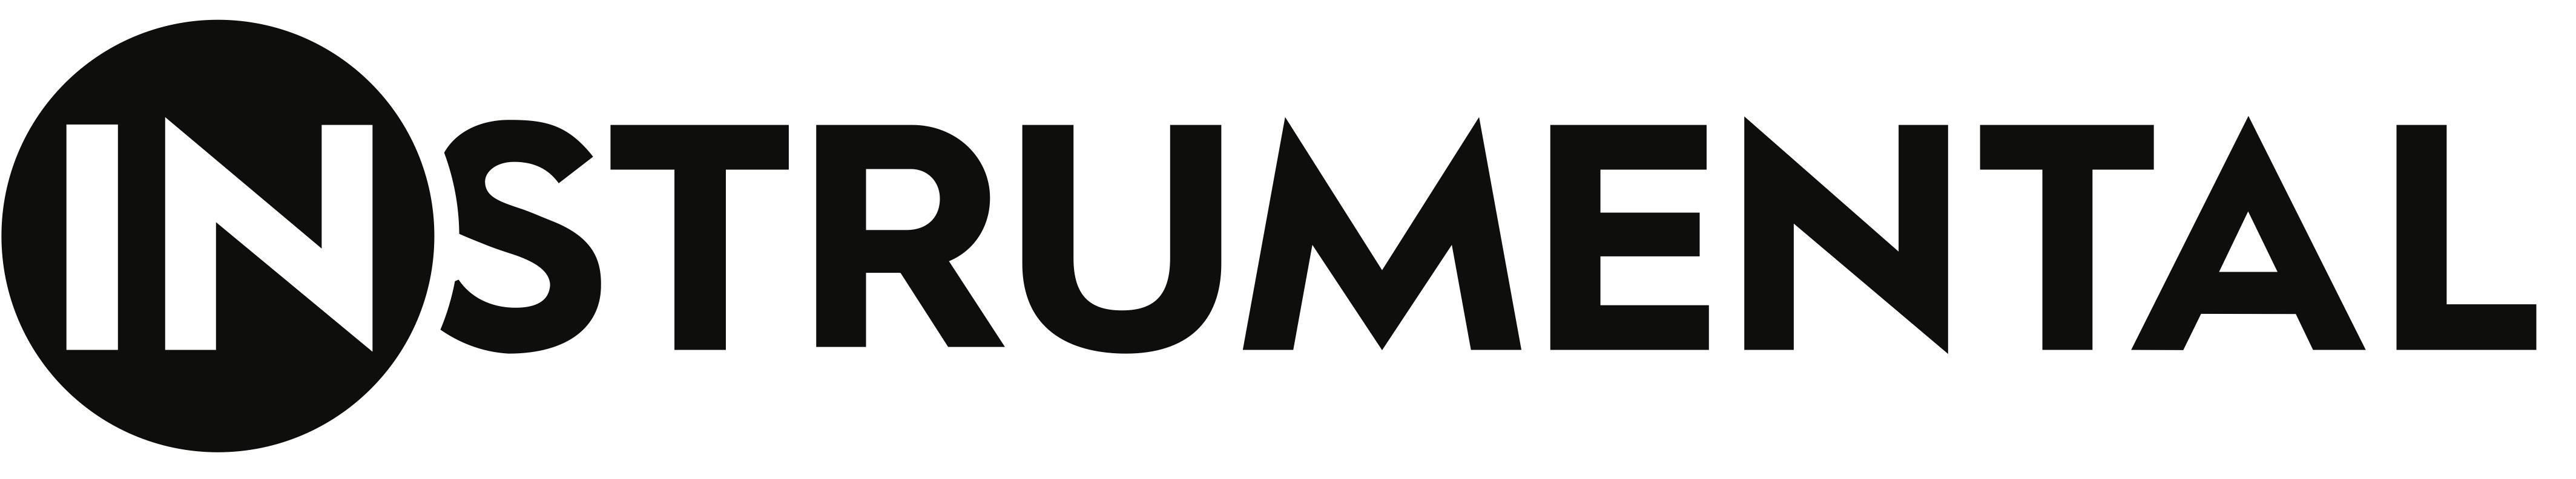 Instrumental logo